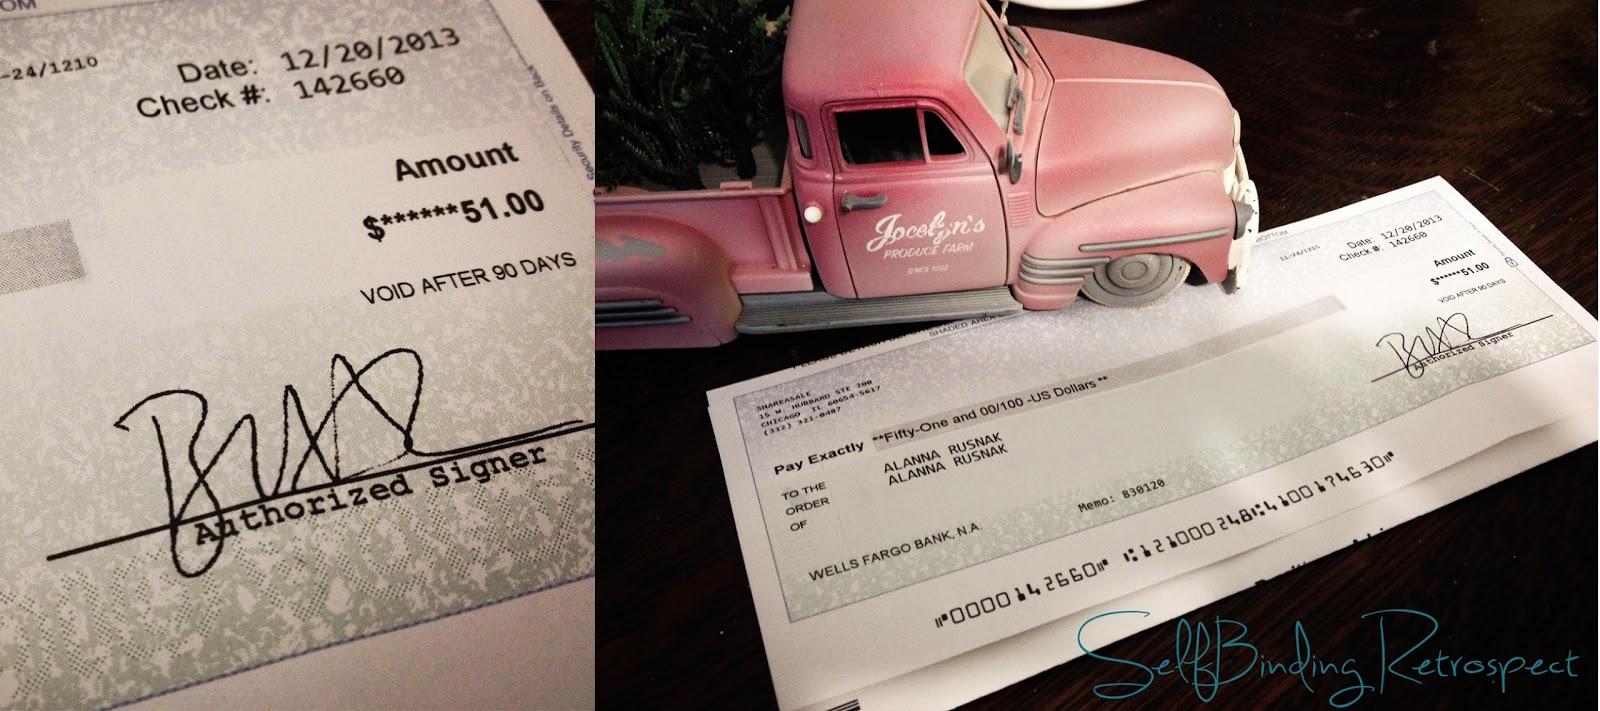 cheque, blog income